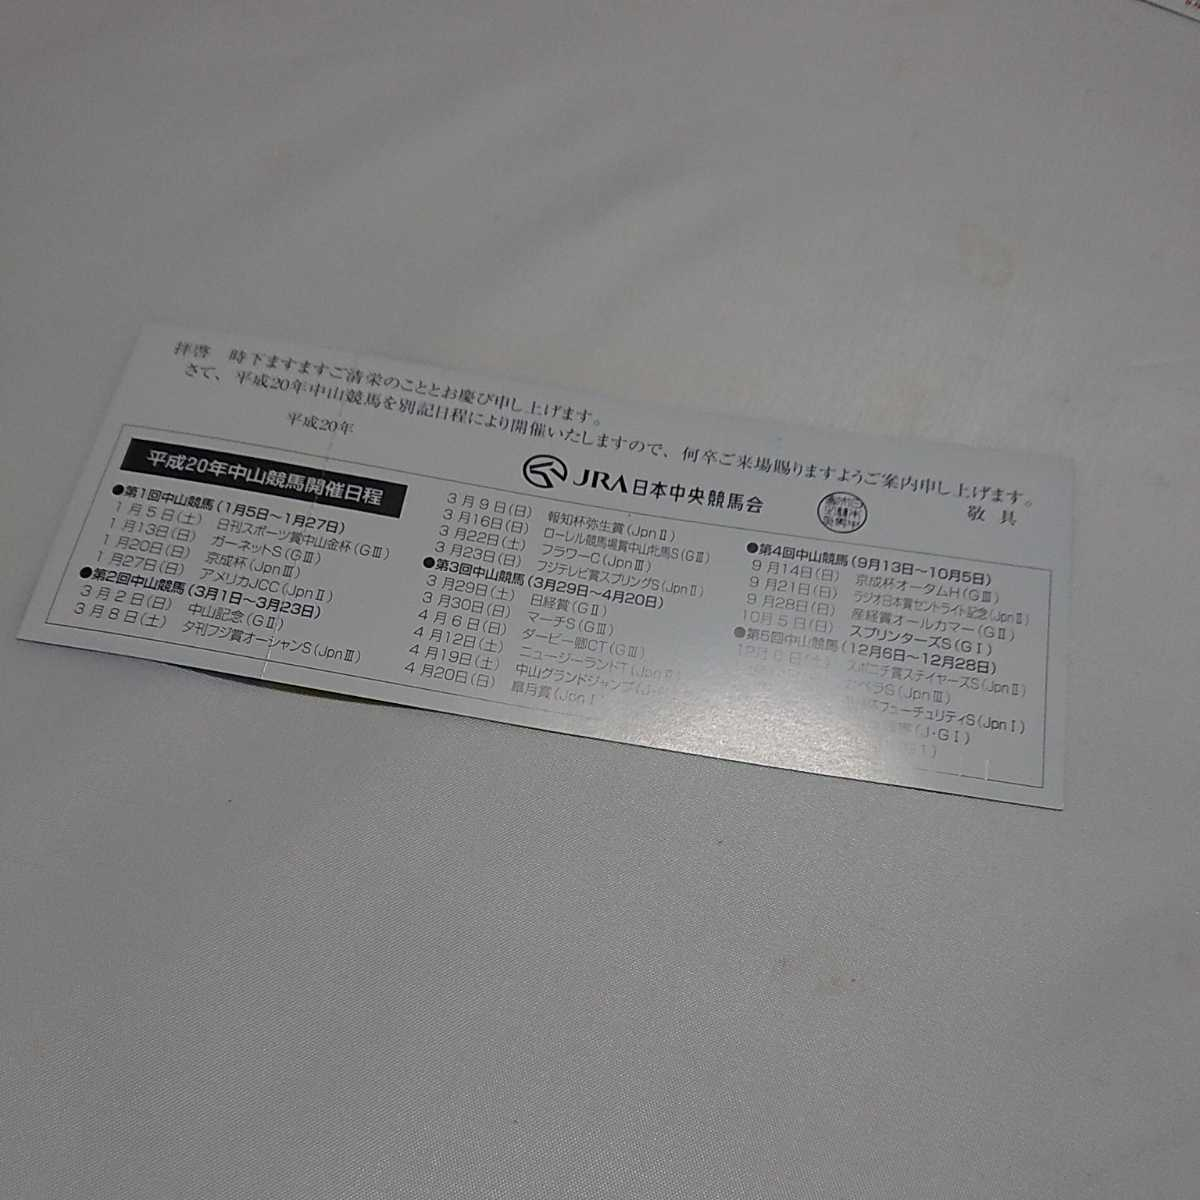 JRA 平成20年 中山競馬 ご招待券 送料込み